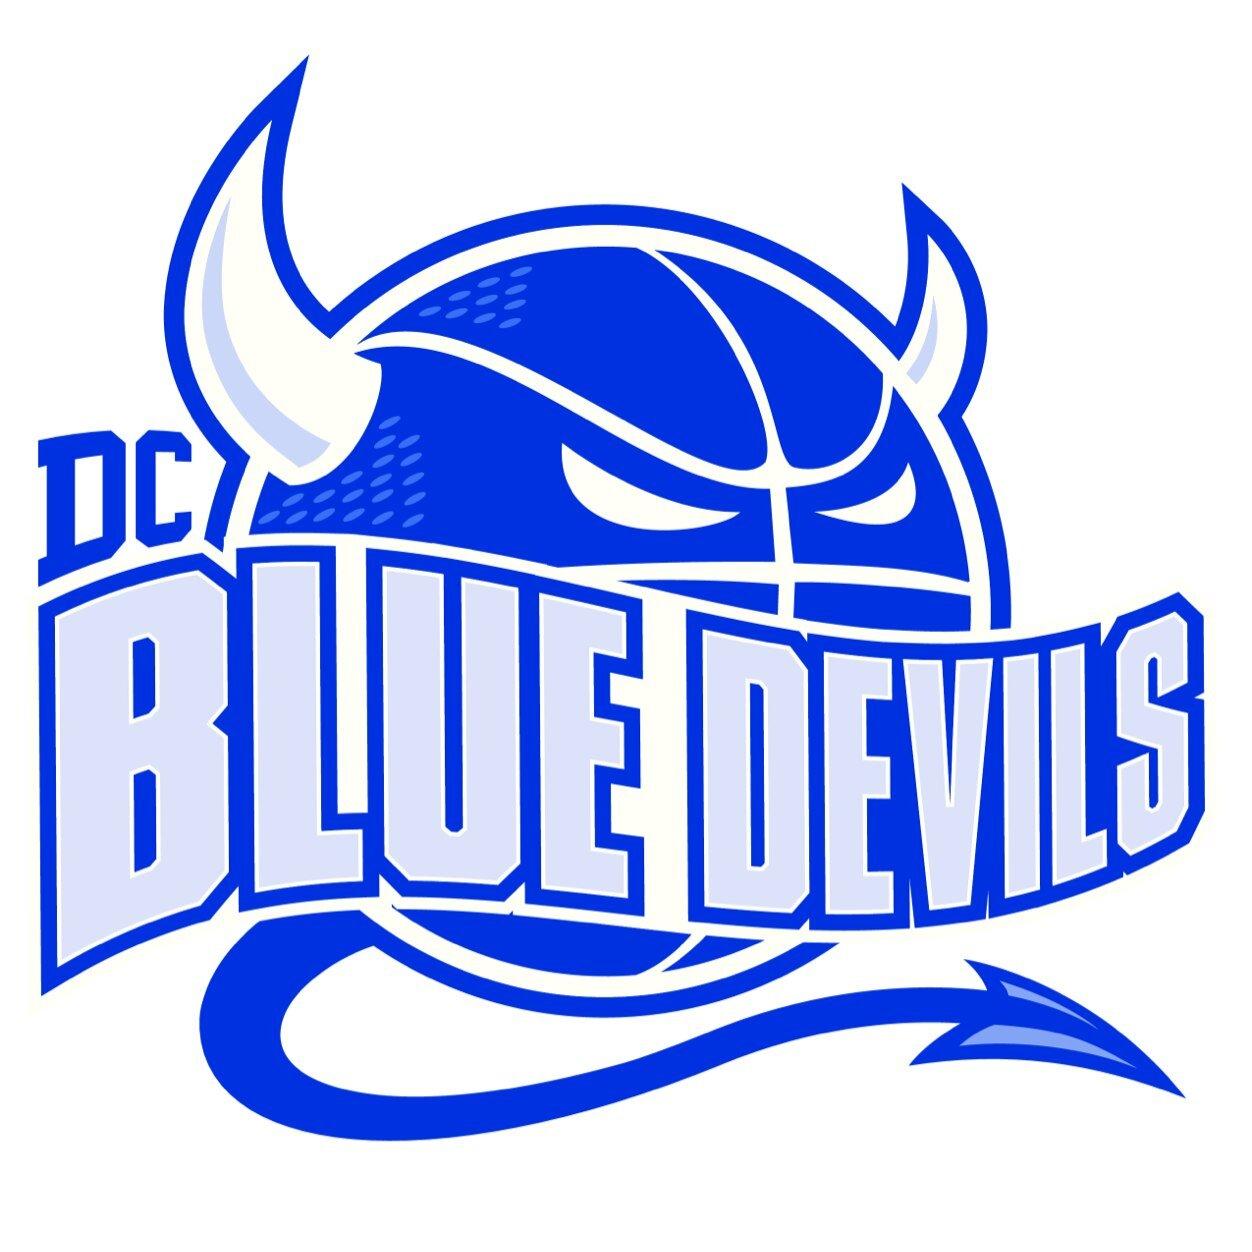 Blue clipart basketball. Dc devils nh dcbluedevilsnh